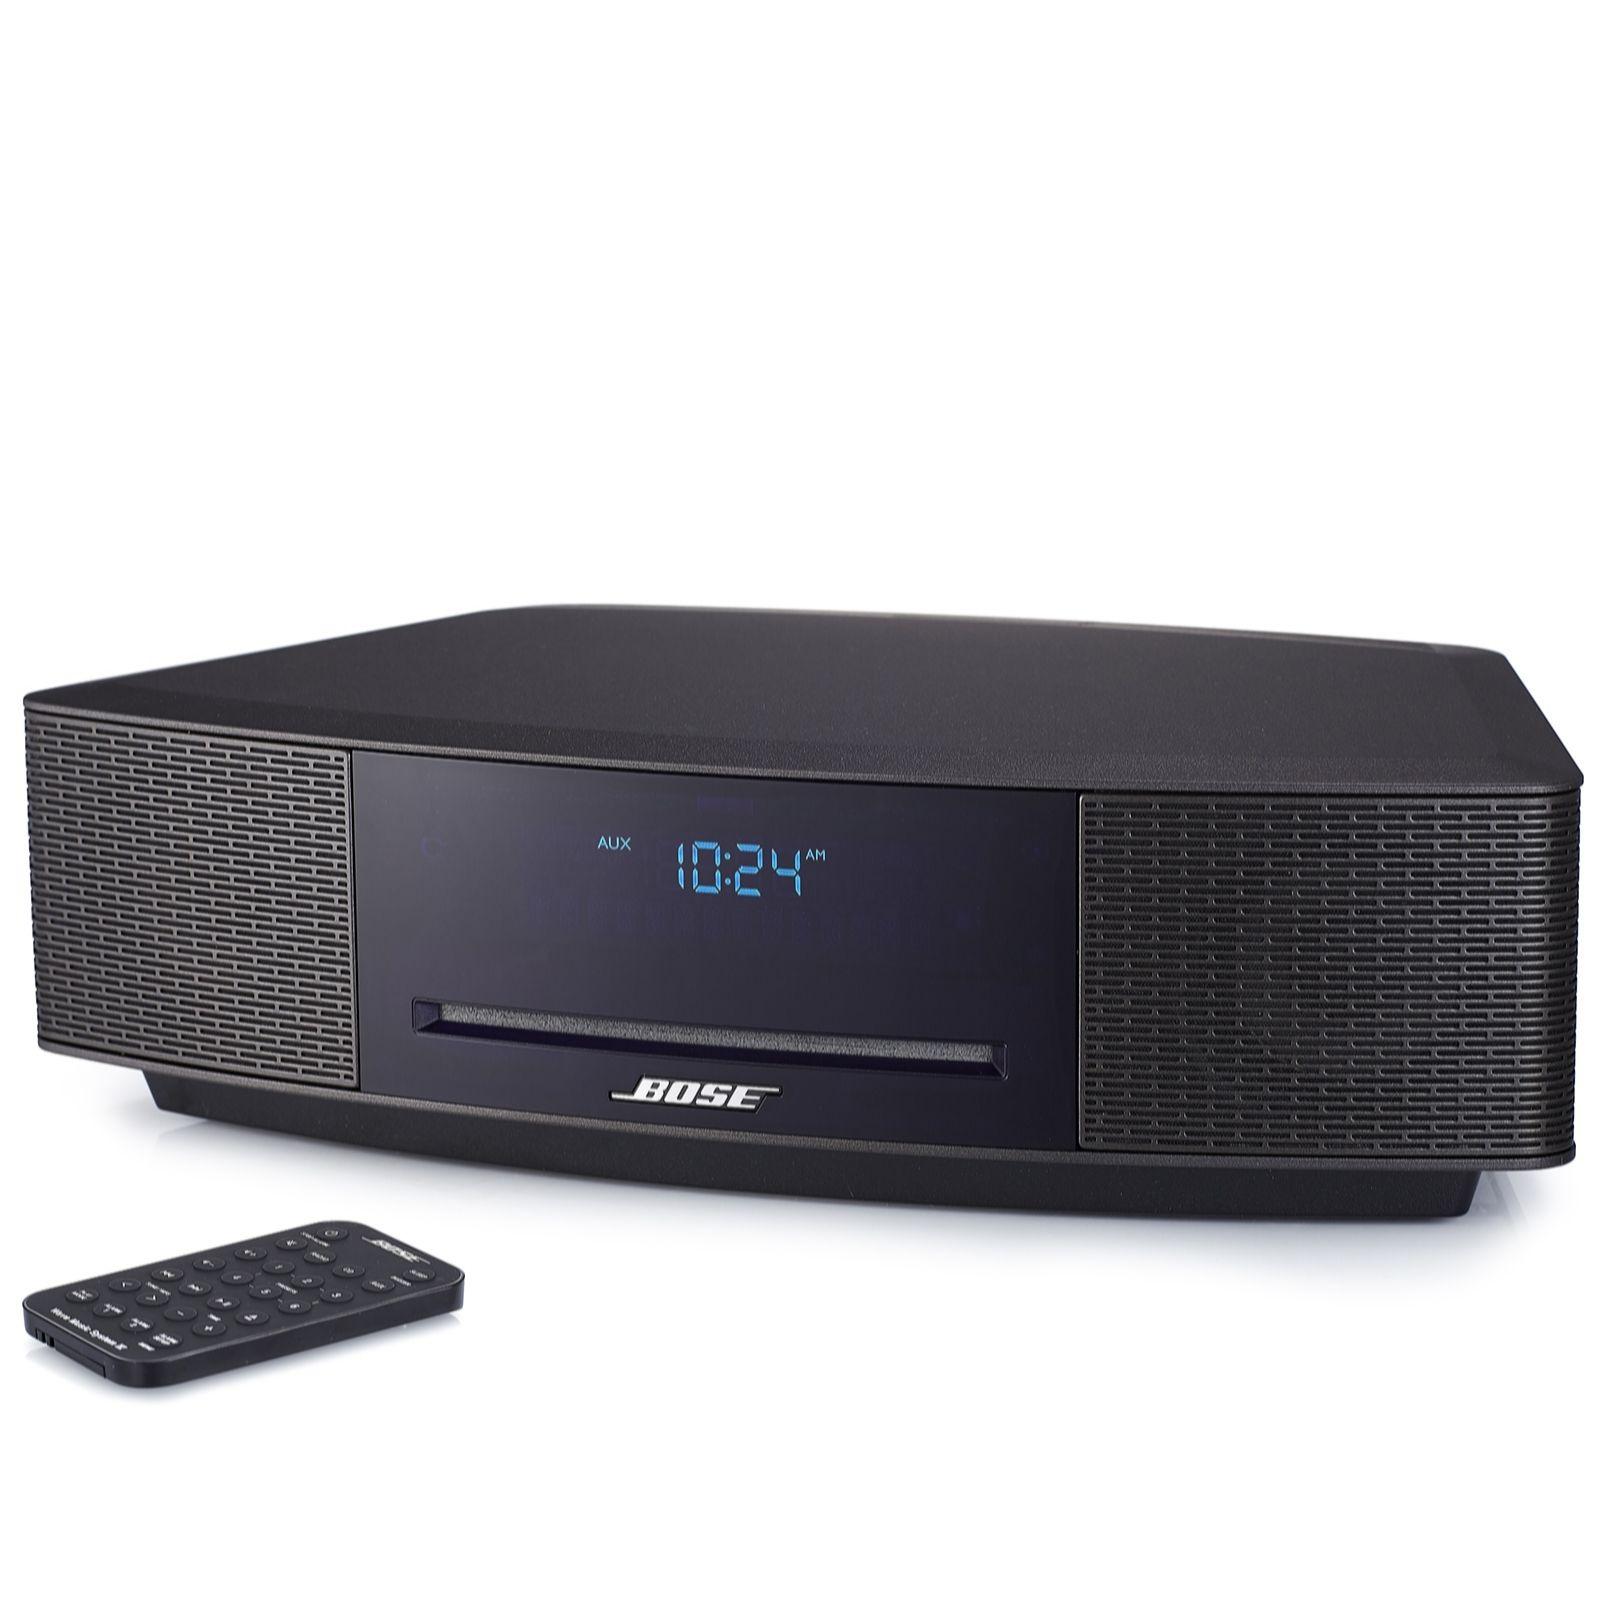 bose dab radio. bose wave music system iv with dab/am/fm tuner \u0026 cd player - page 1 qvc uk dab radio t